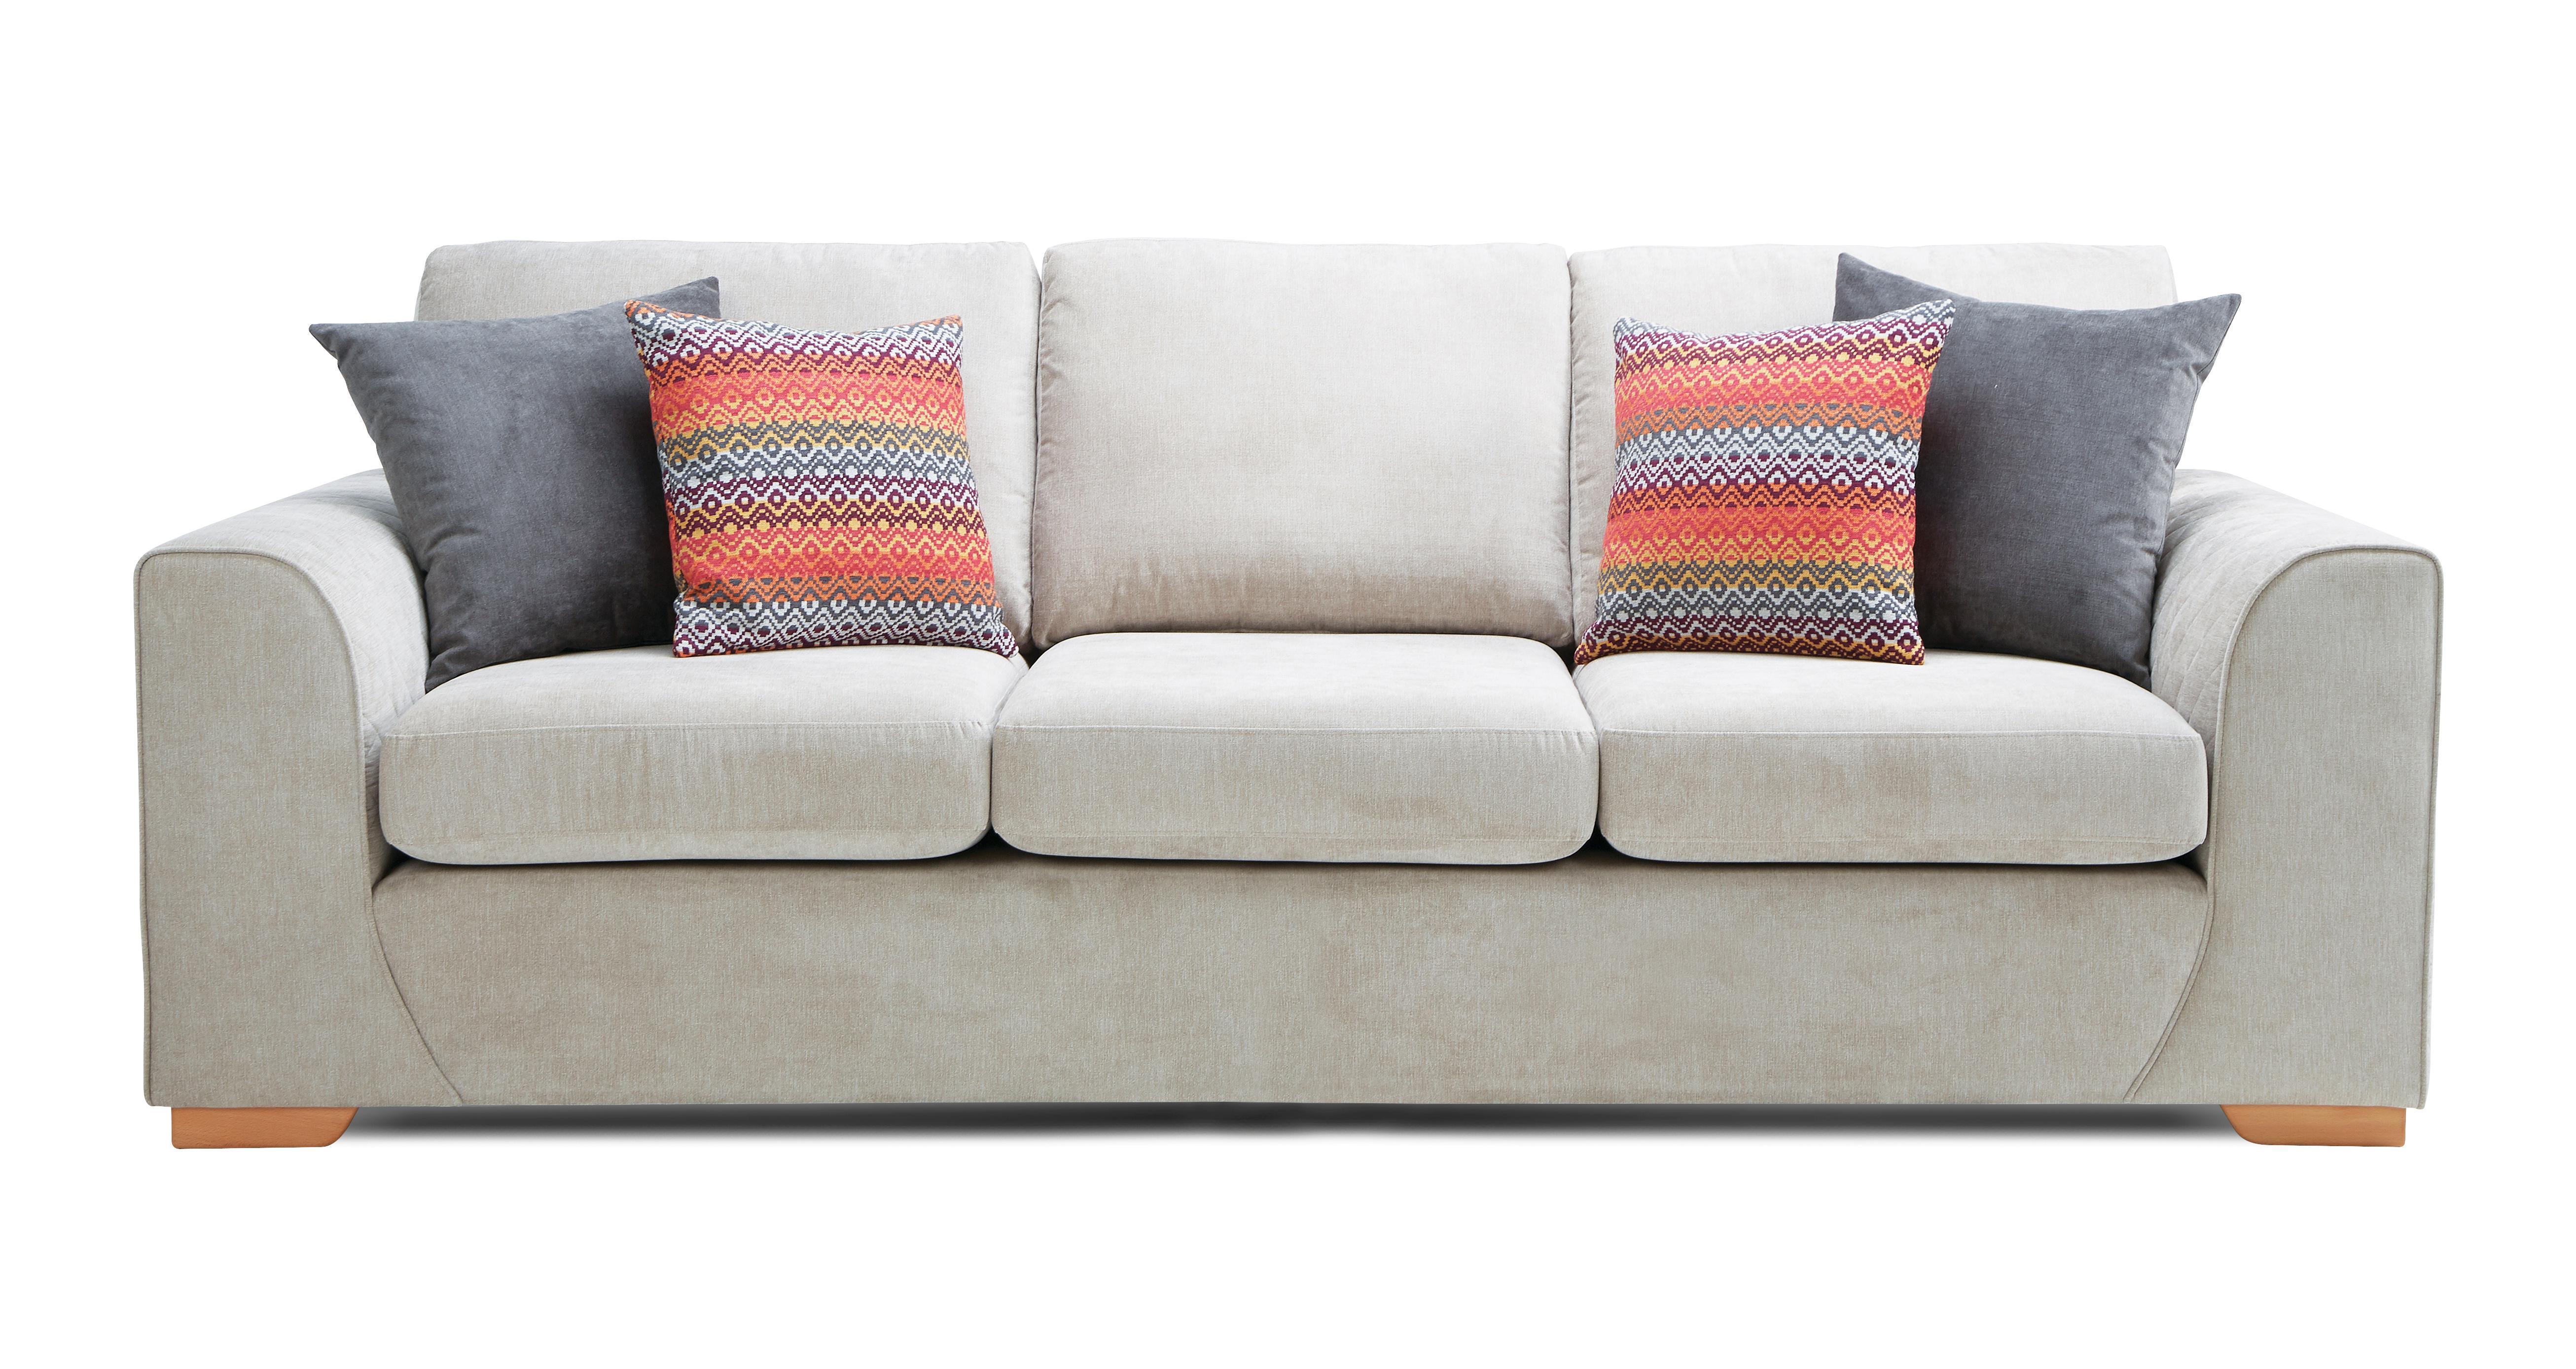 Swell Marquee 4 Seater Sofa Machost Co Dining Chair Design Ideas Machostcouk